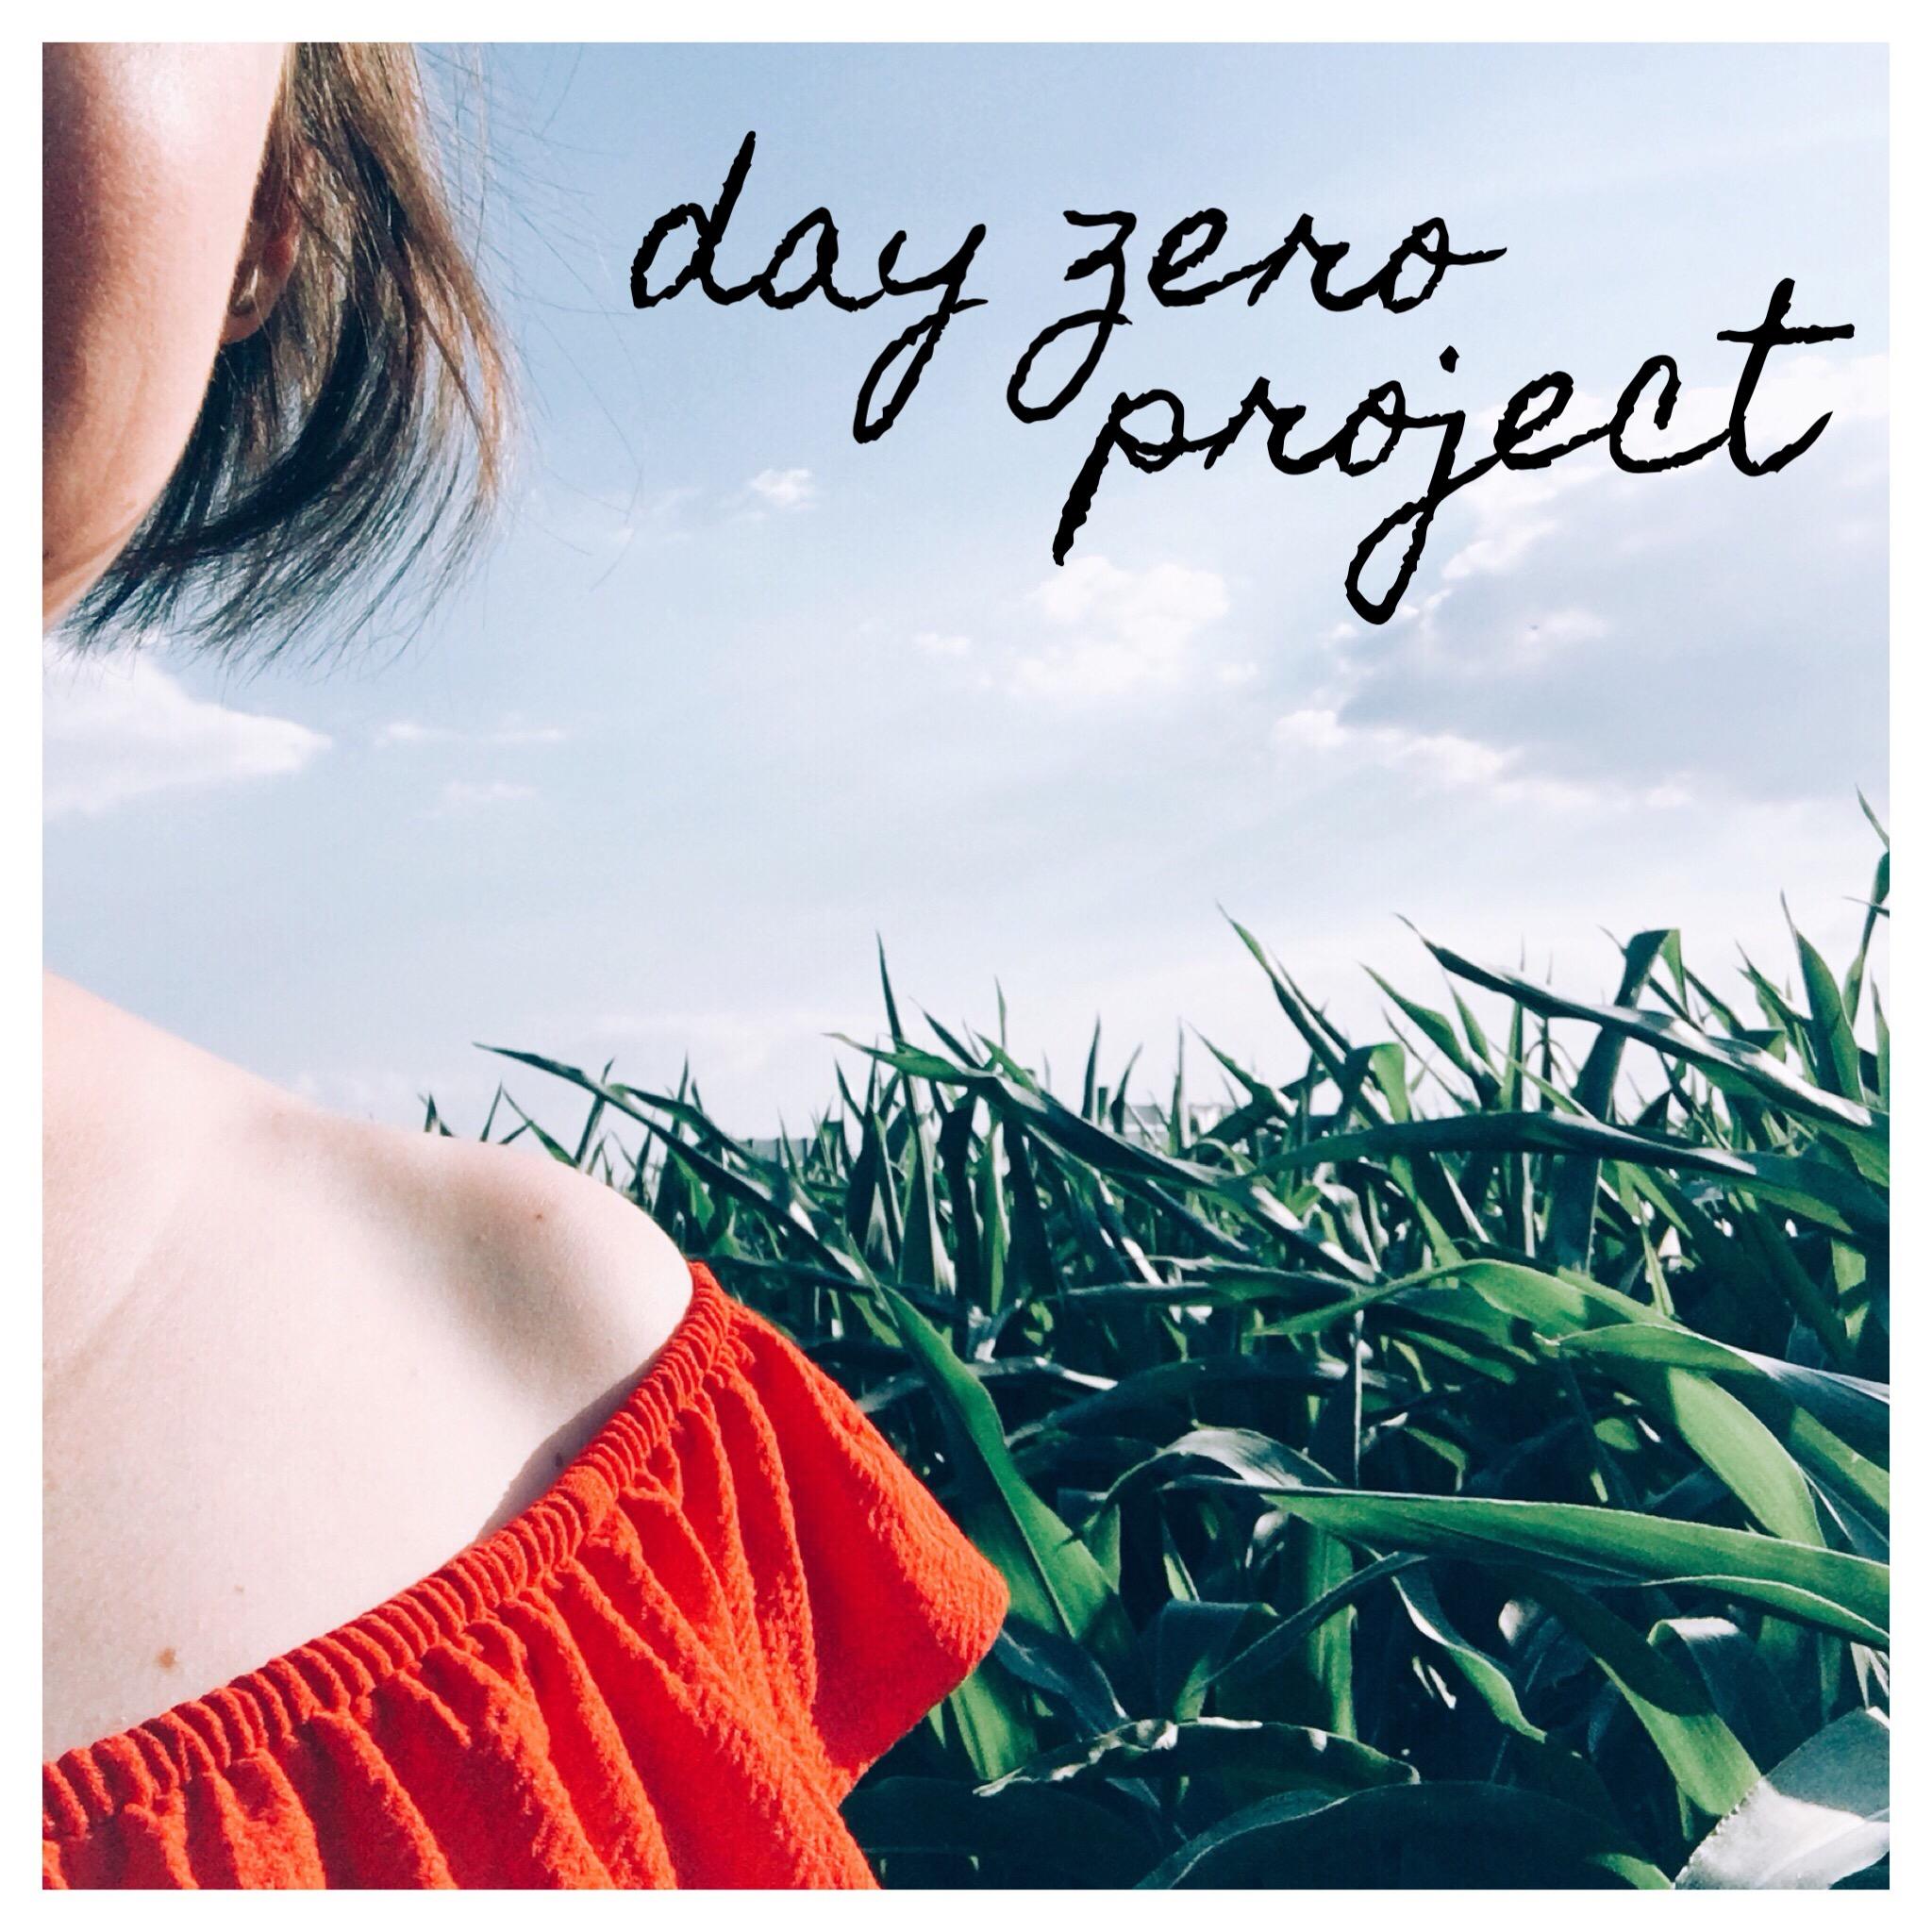 Day zero project   Update 5